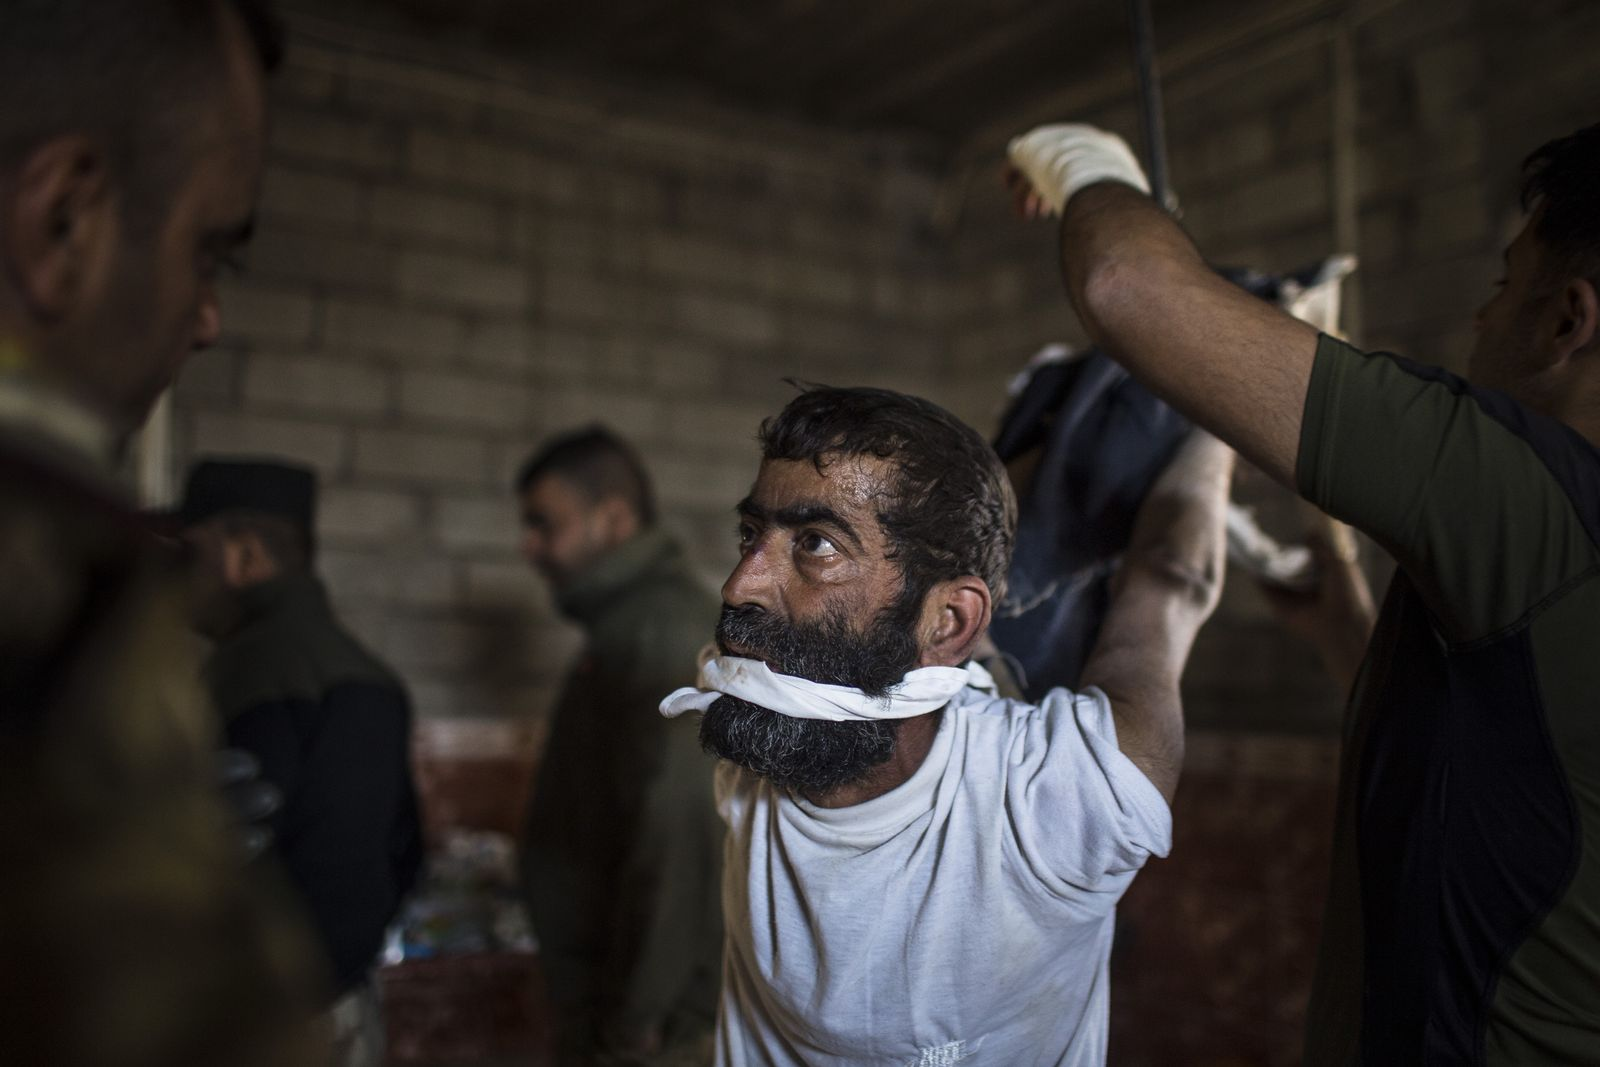 Männer frauen foltern Grausame Foltermethoden